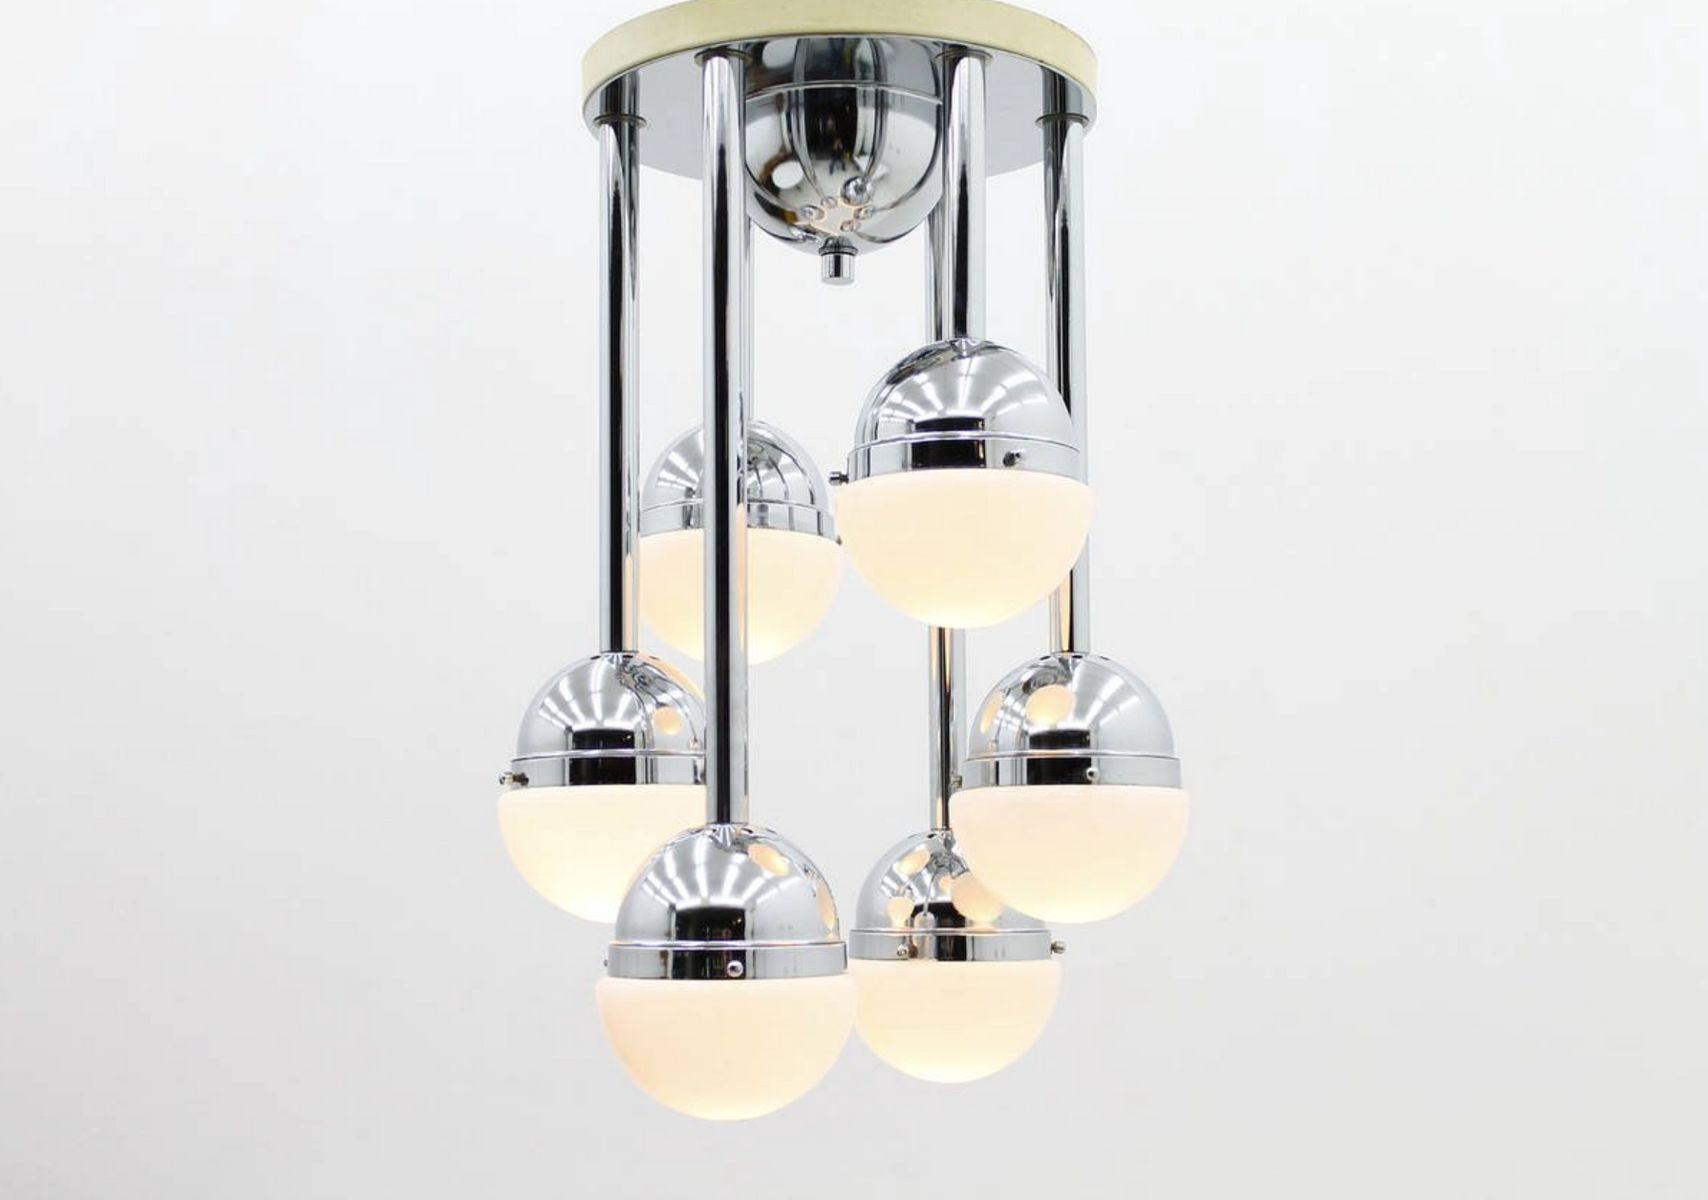 Italienische Kaskaden Deckenlampe, 1970er